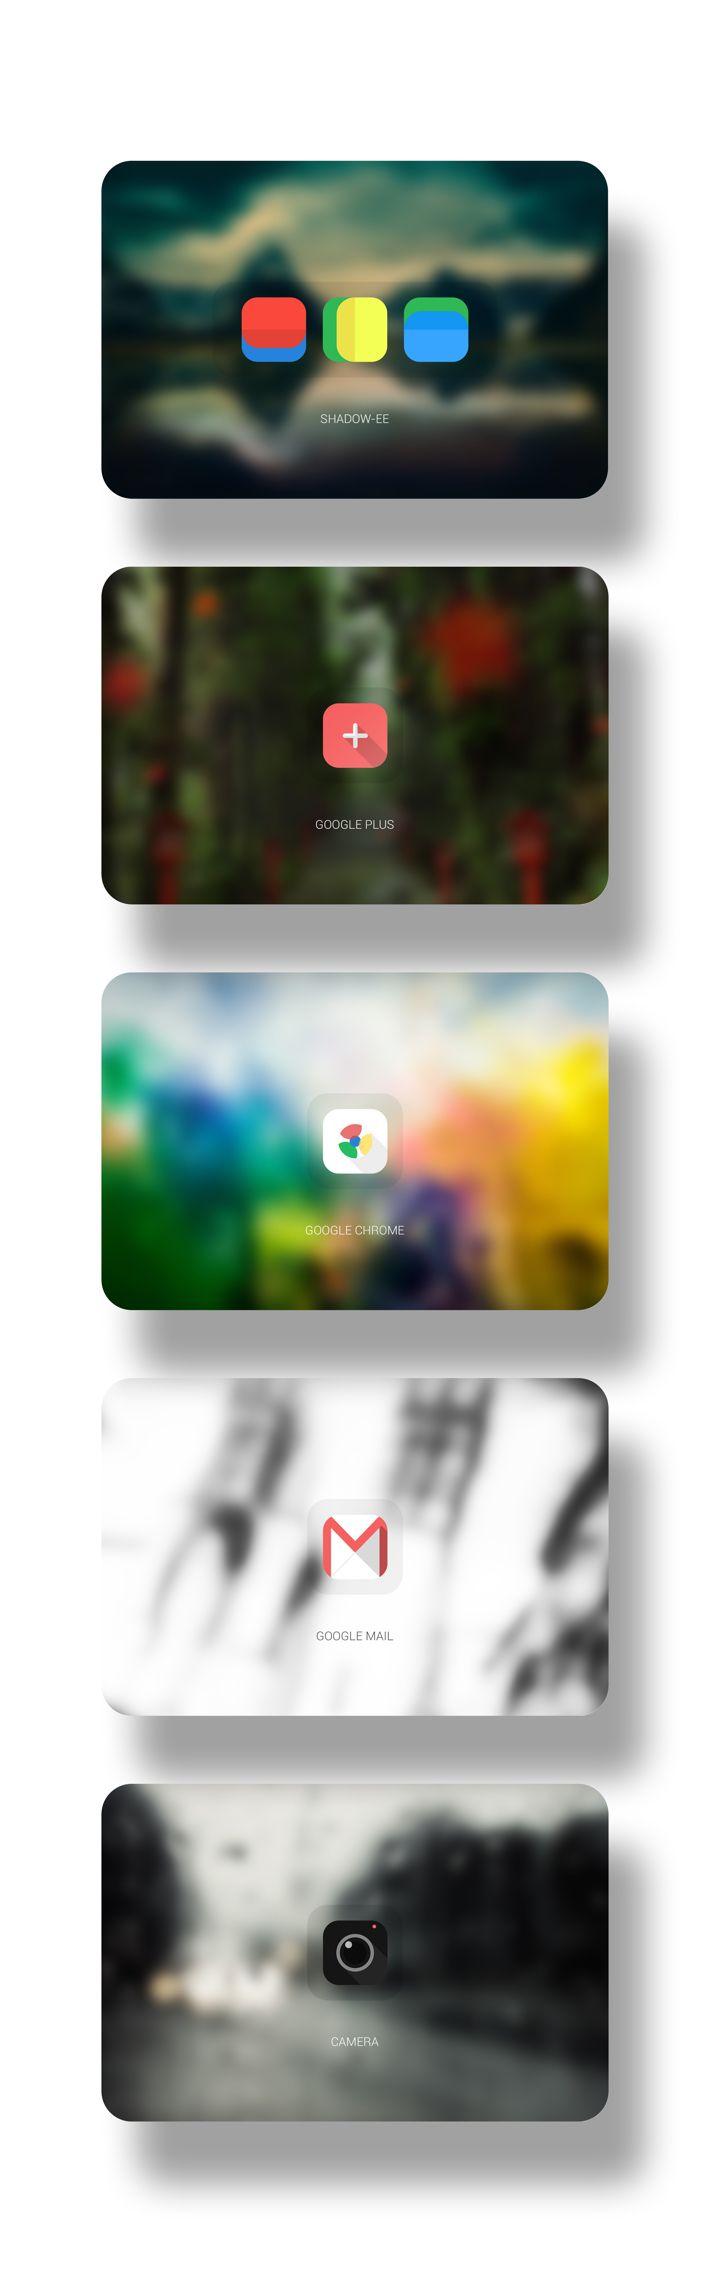 Long shadow / Flat design / Flat icons / #flat #icons #design